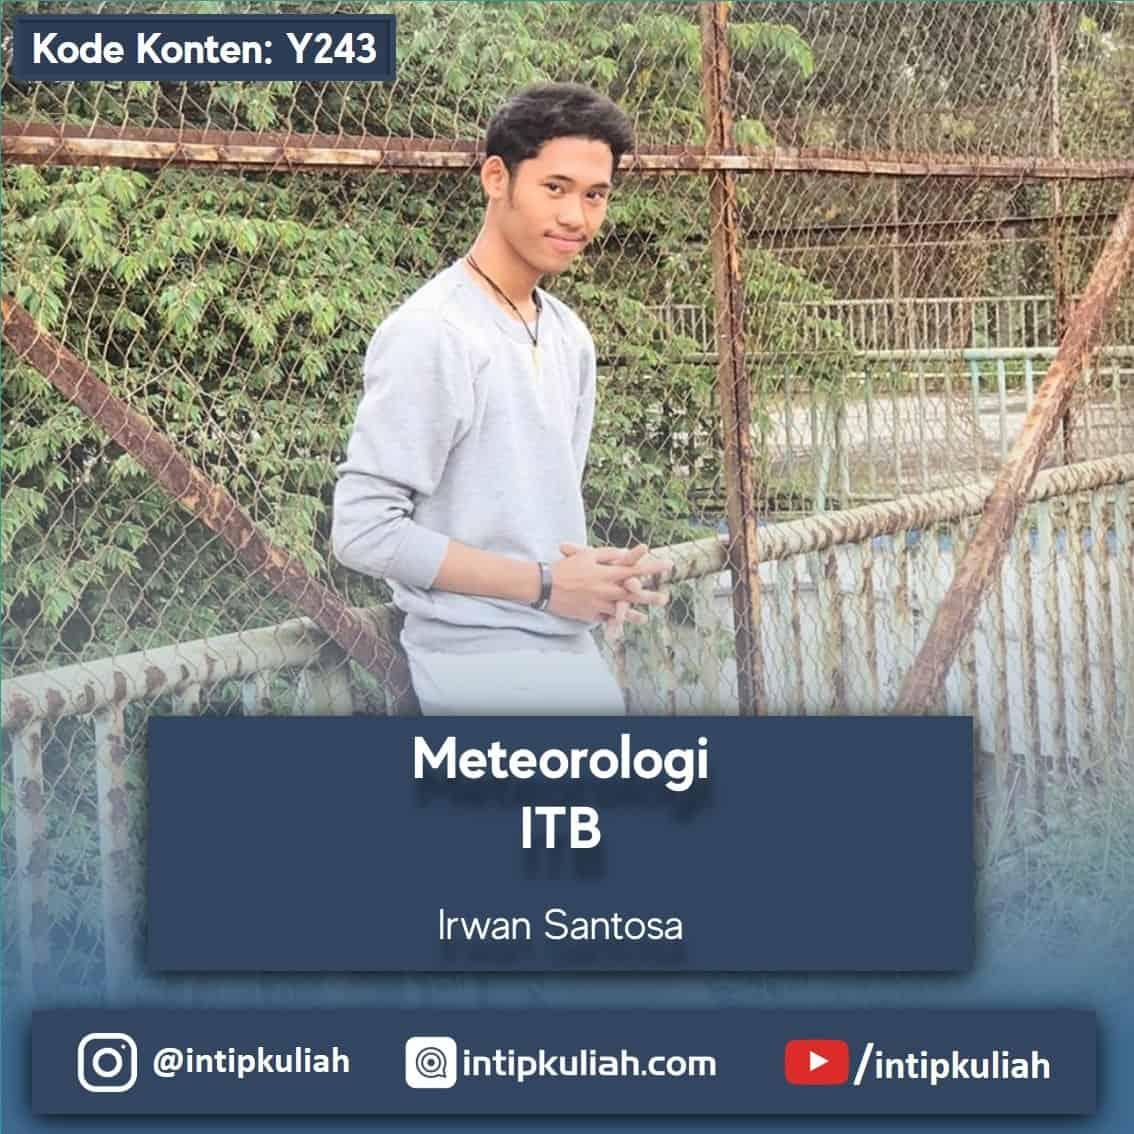 Meteorologi ITB (Irwan)